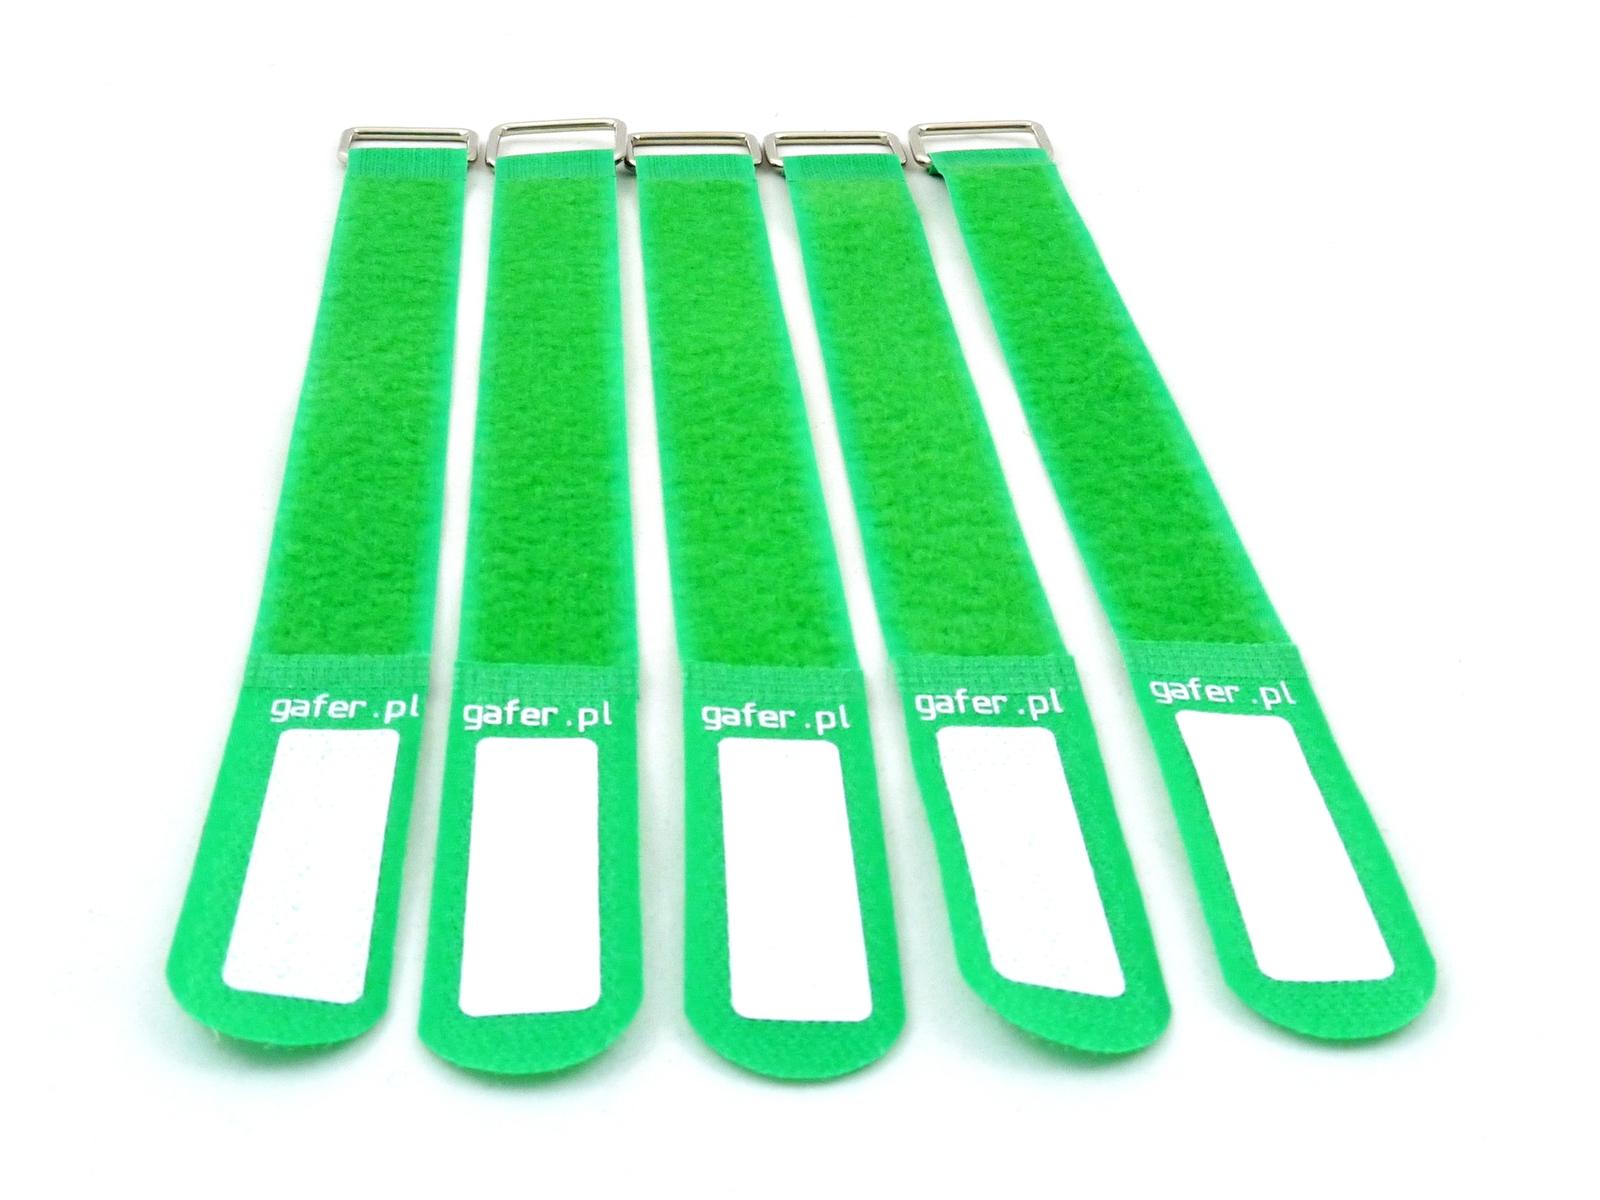 GAFER.PL Kabelbinder Klettverschluss 25x550mm 5er Pack grün